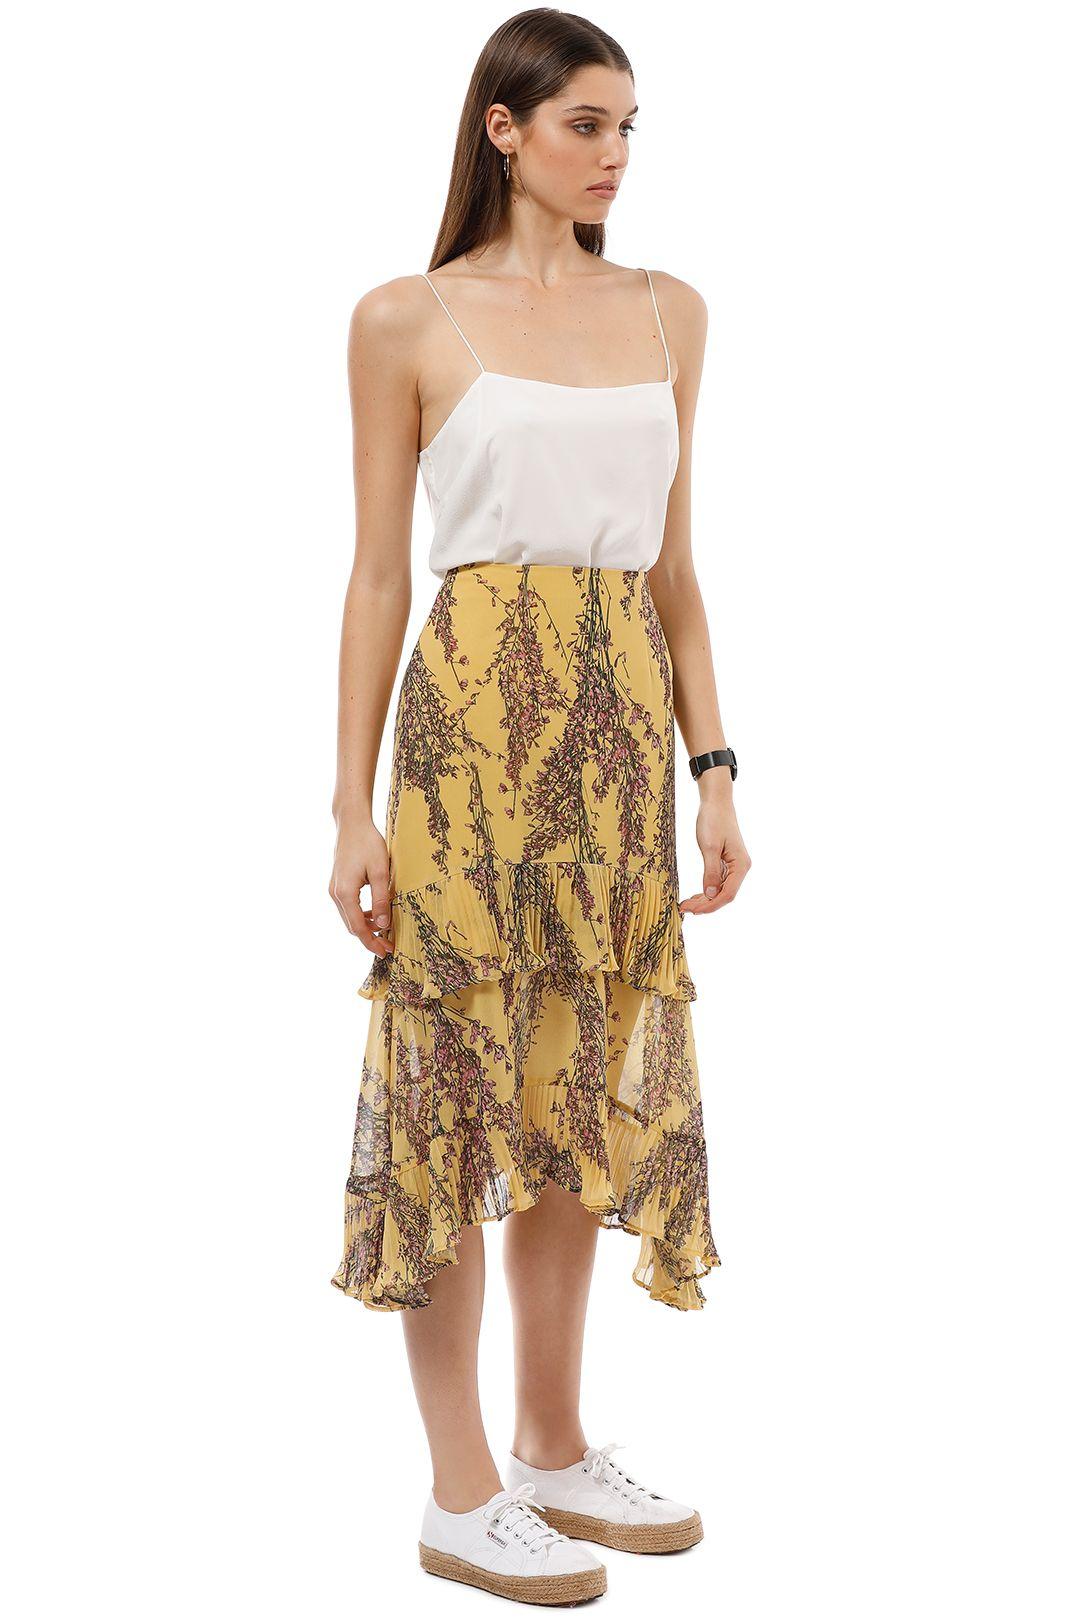 Keepsake the Label - Light Up Skirt - Golden Yellow - Side